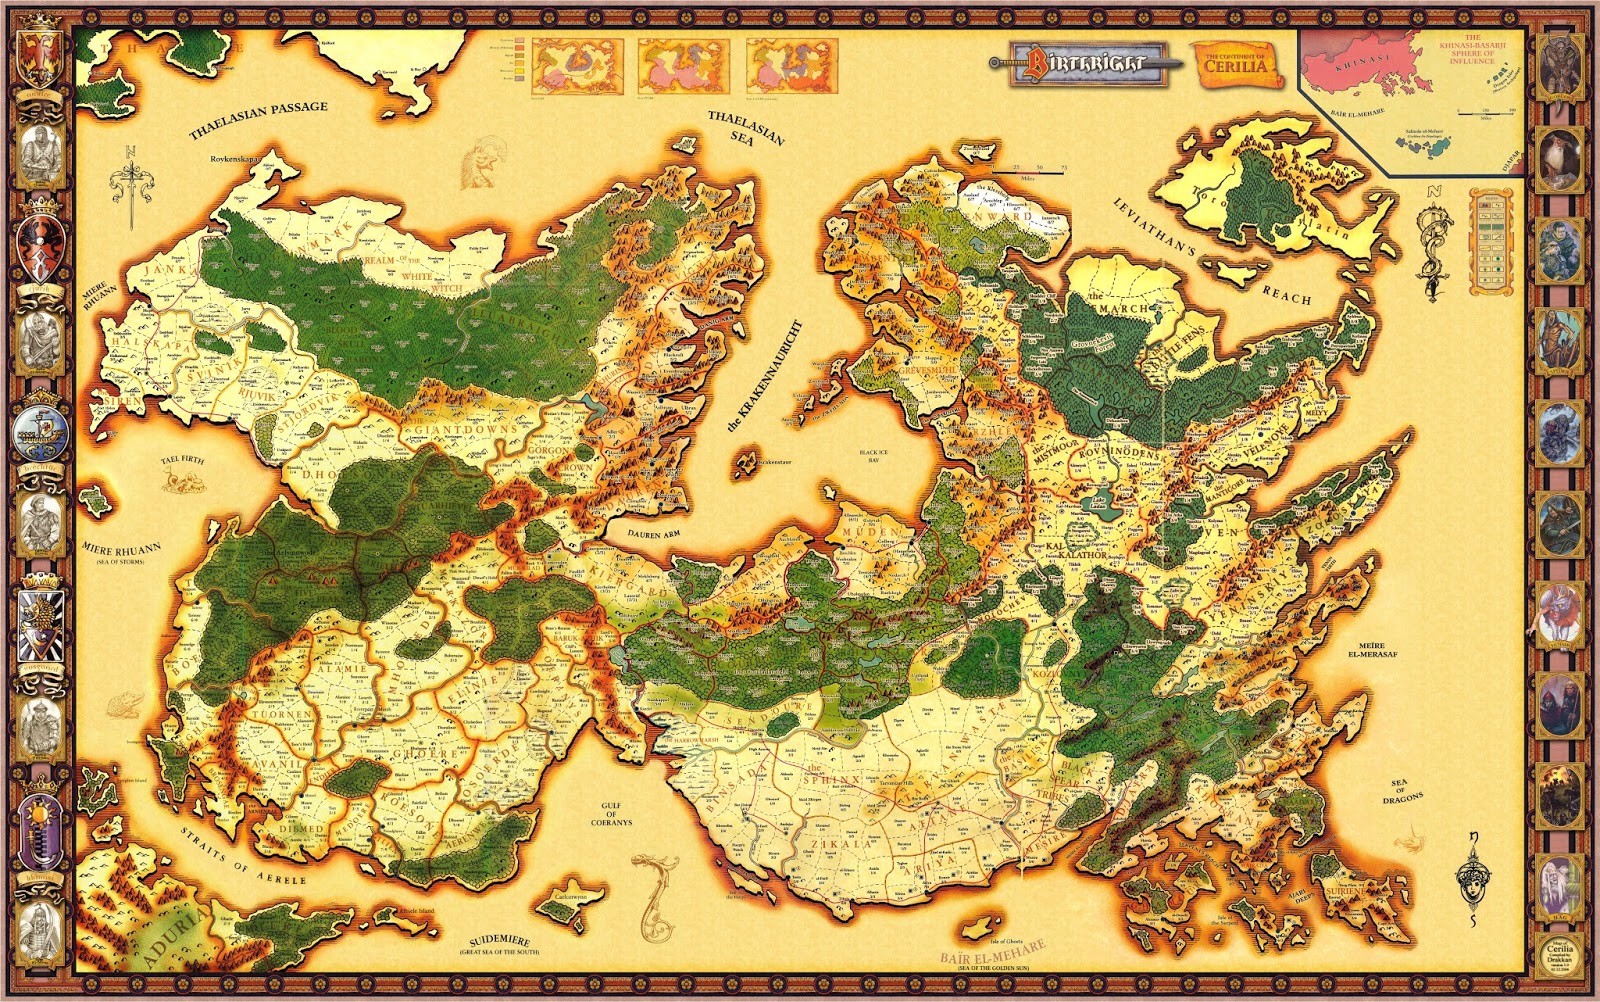 Map - Cerilia - Complete Detailed v1_0